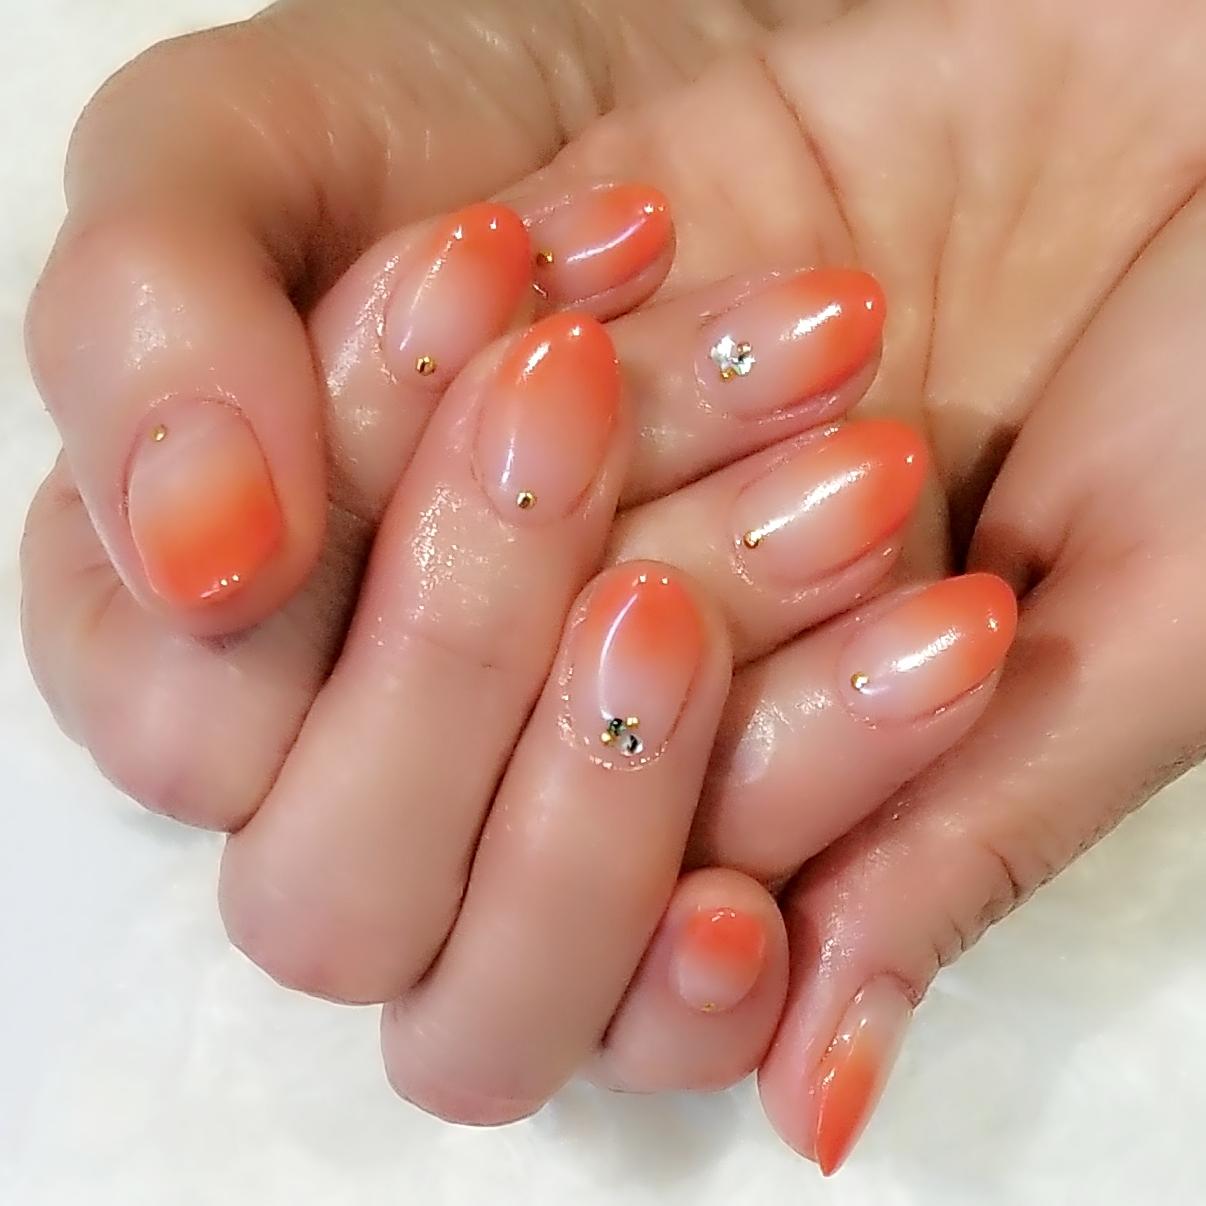 BeautyPlus_20180601121933889_save